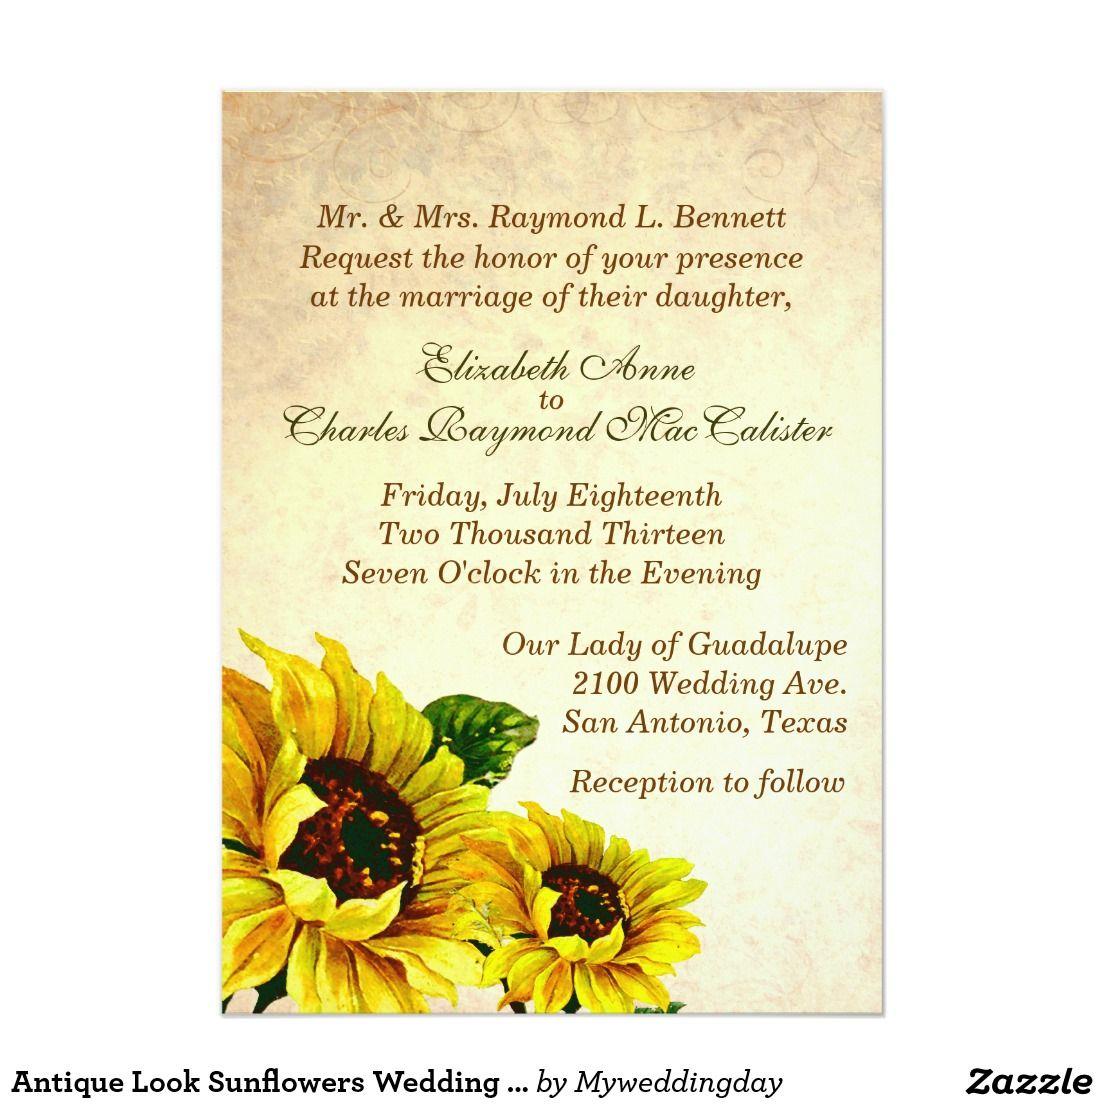 Antique Look Sunflowers Wedding Invitation | *Sunflower Wedding ...